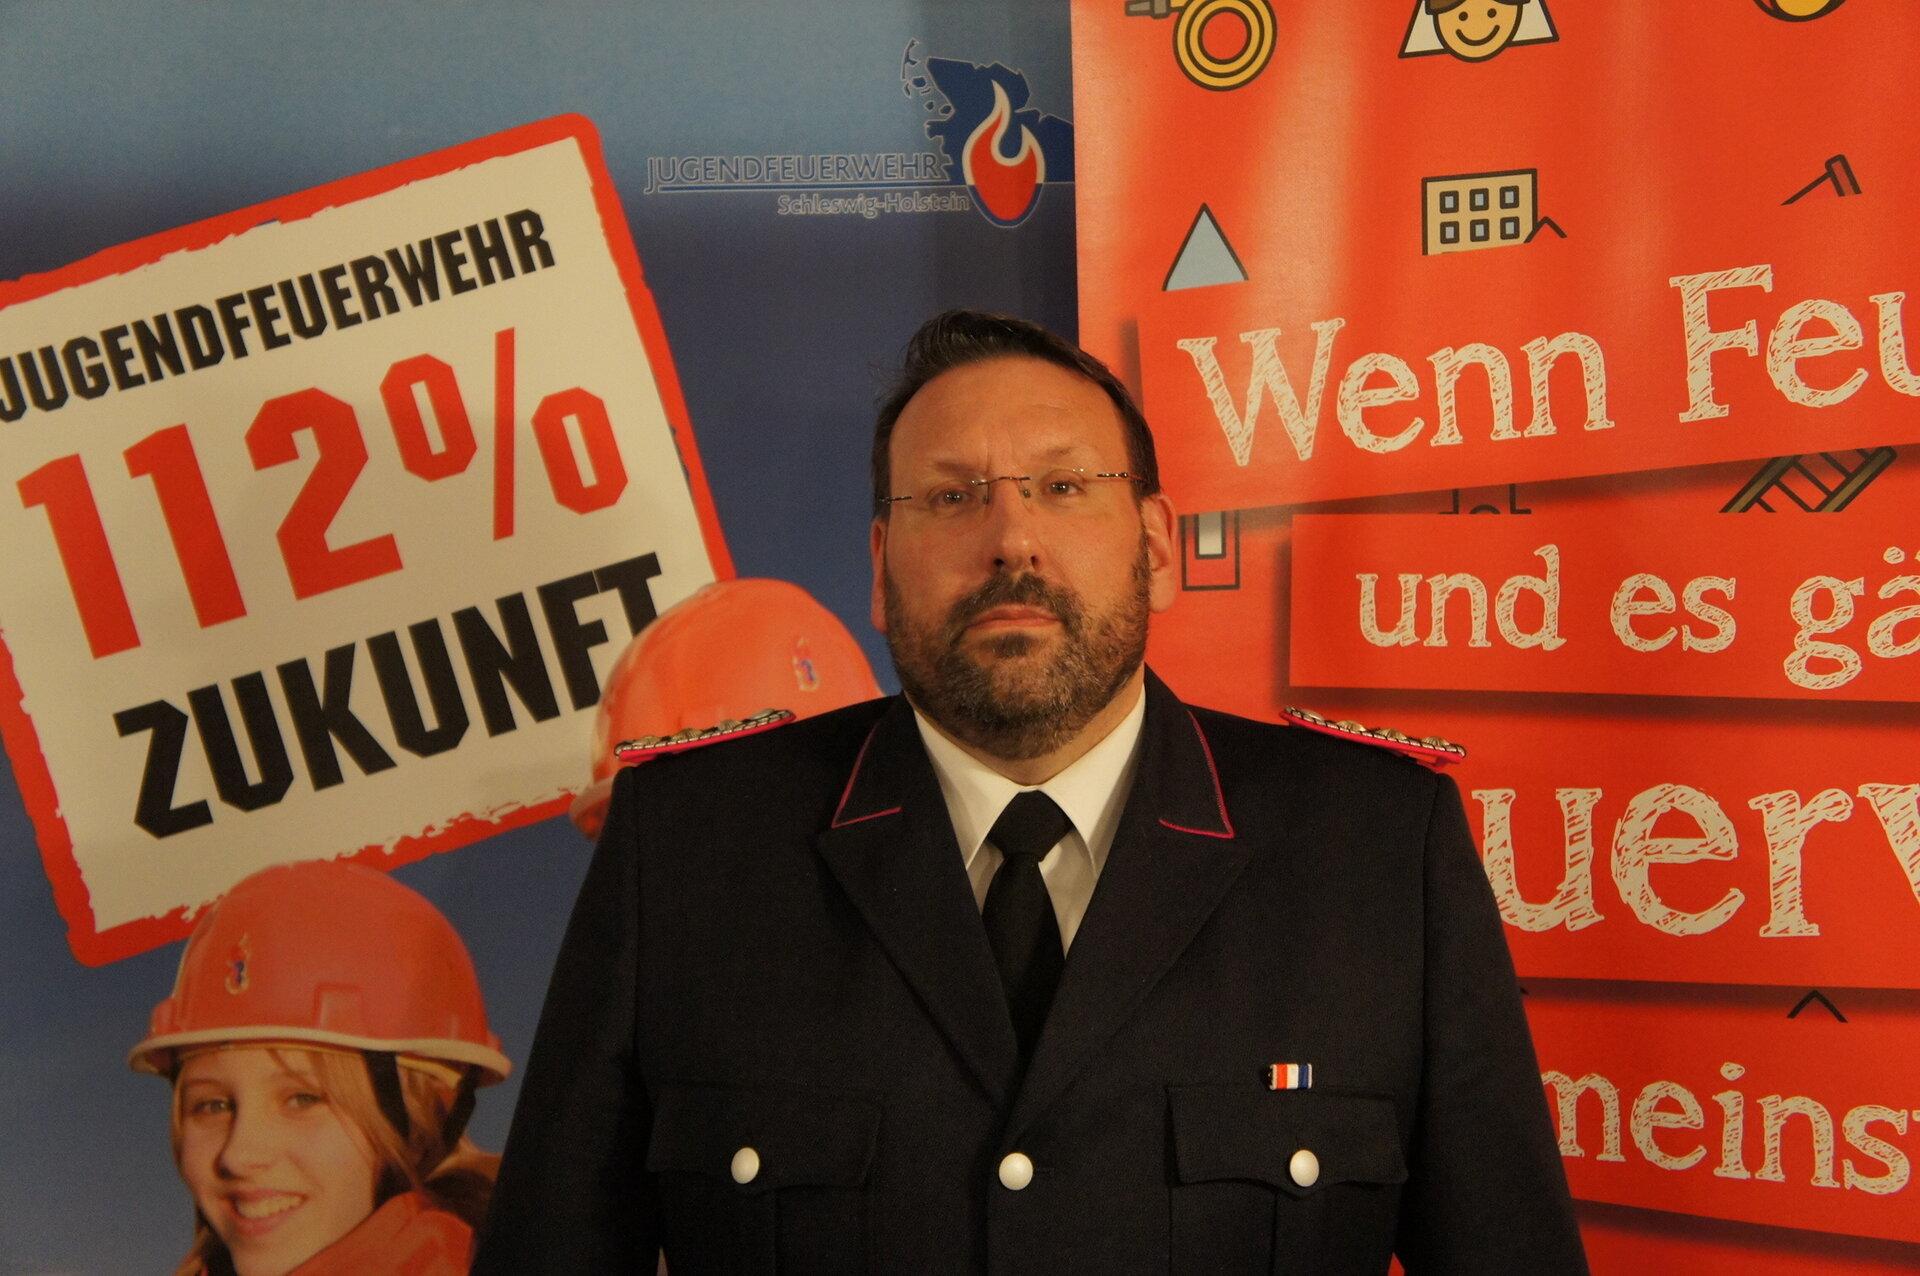 Thorsten Hassel